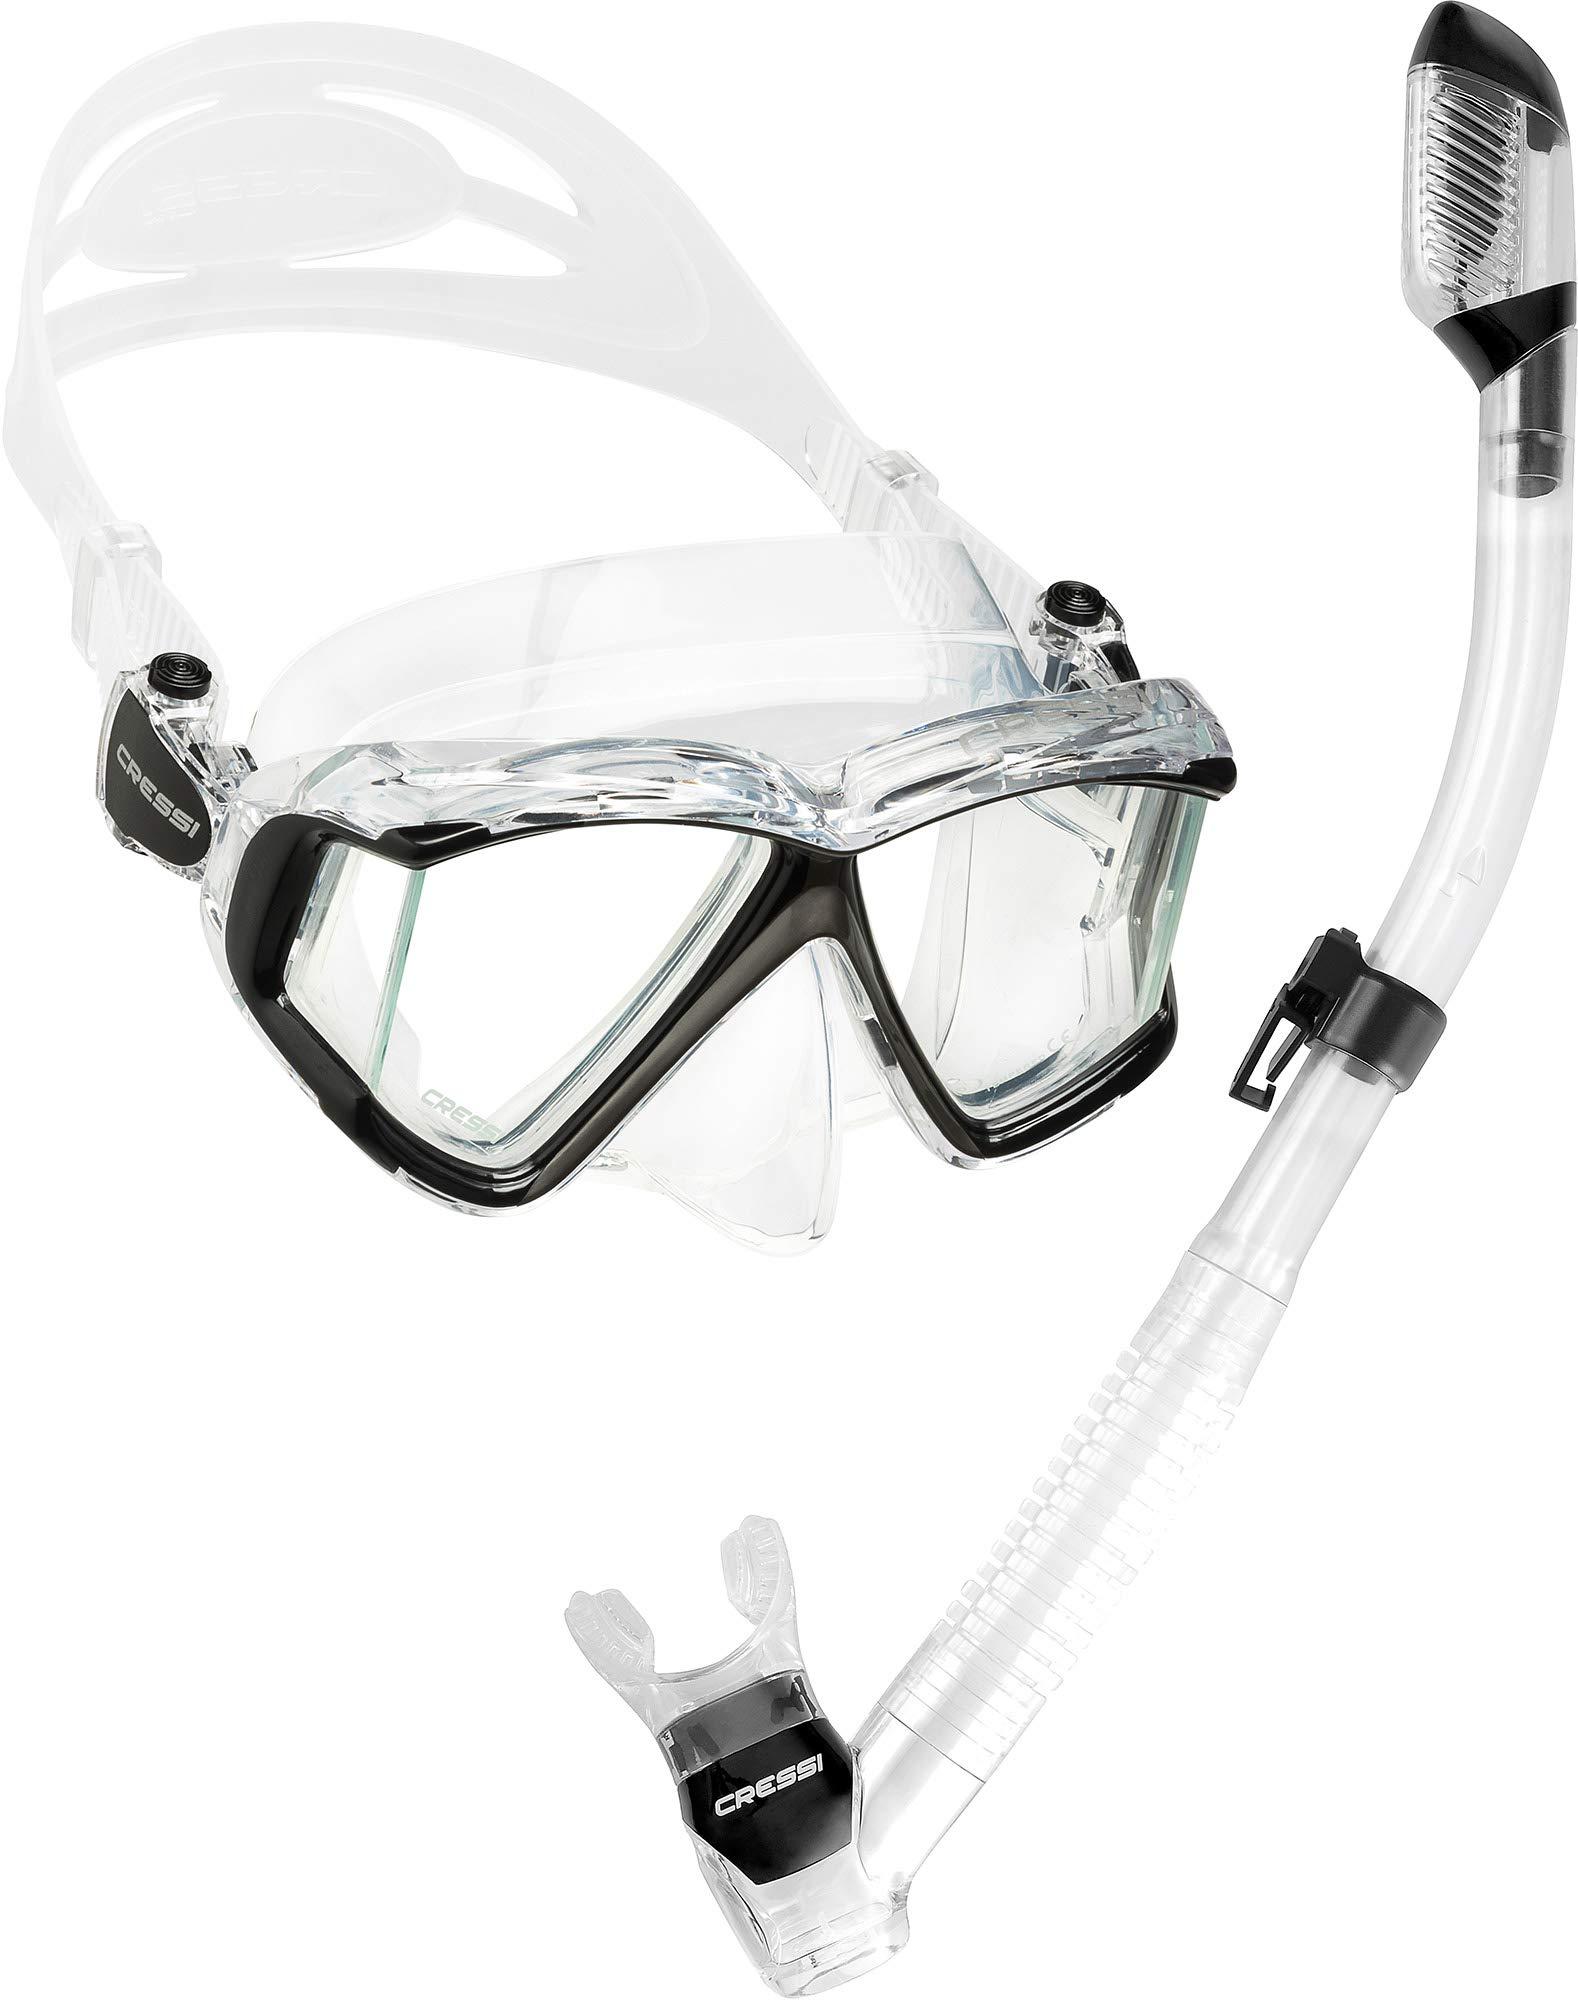 Cressi Pano 4 & Supernova Dry, Clear/Black/Silver